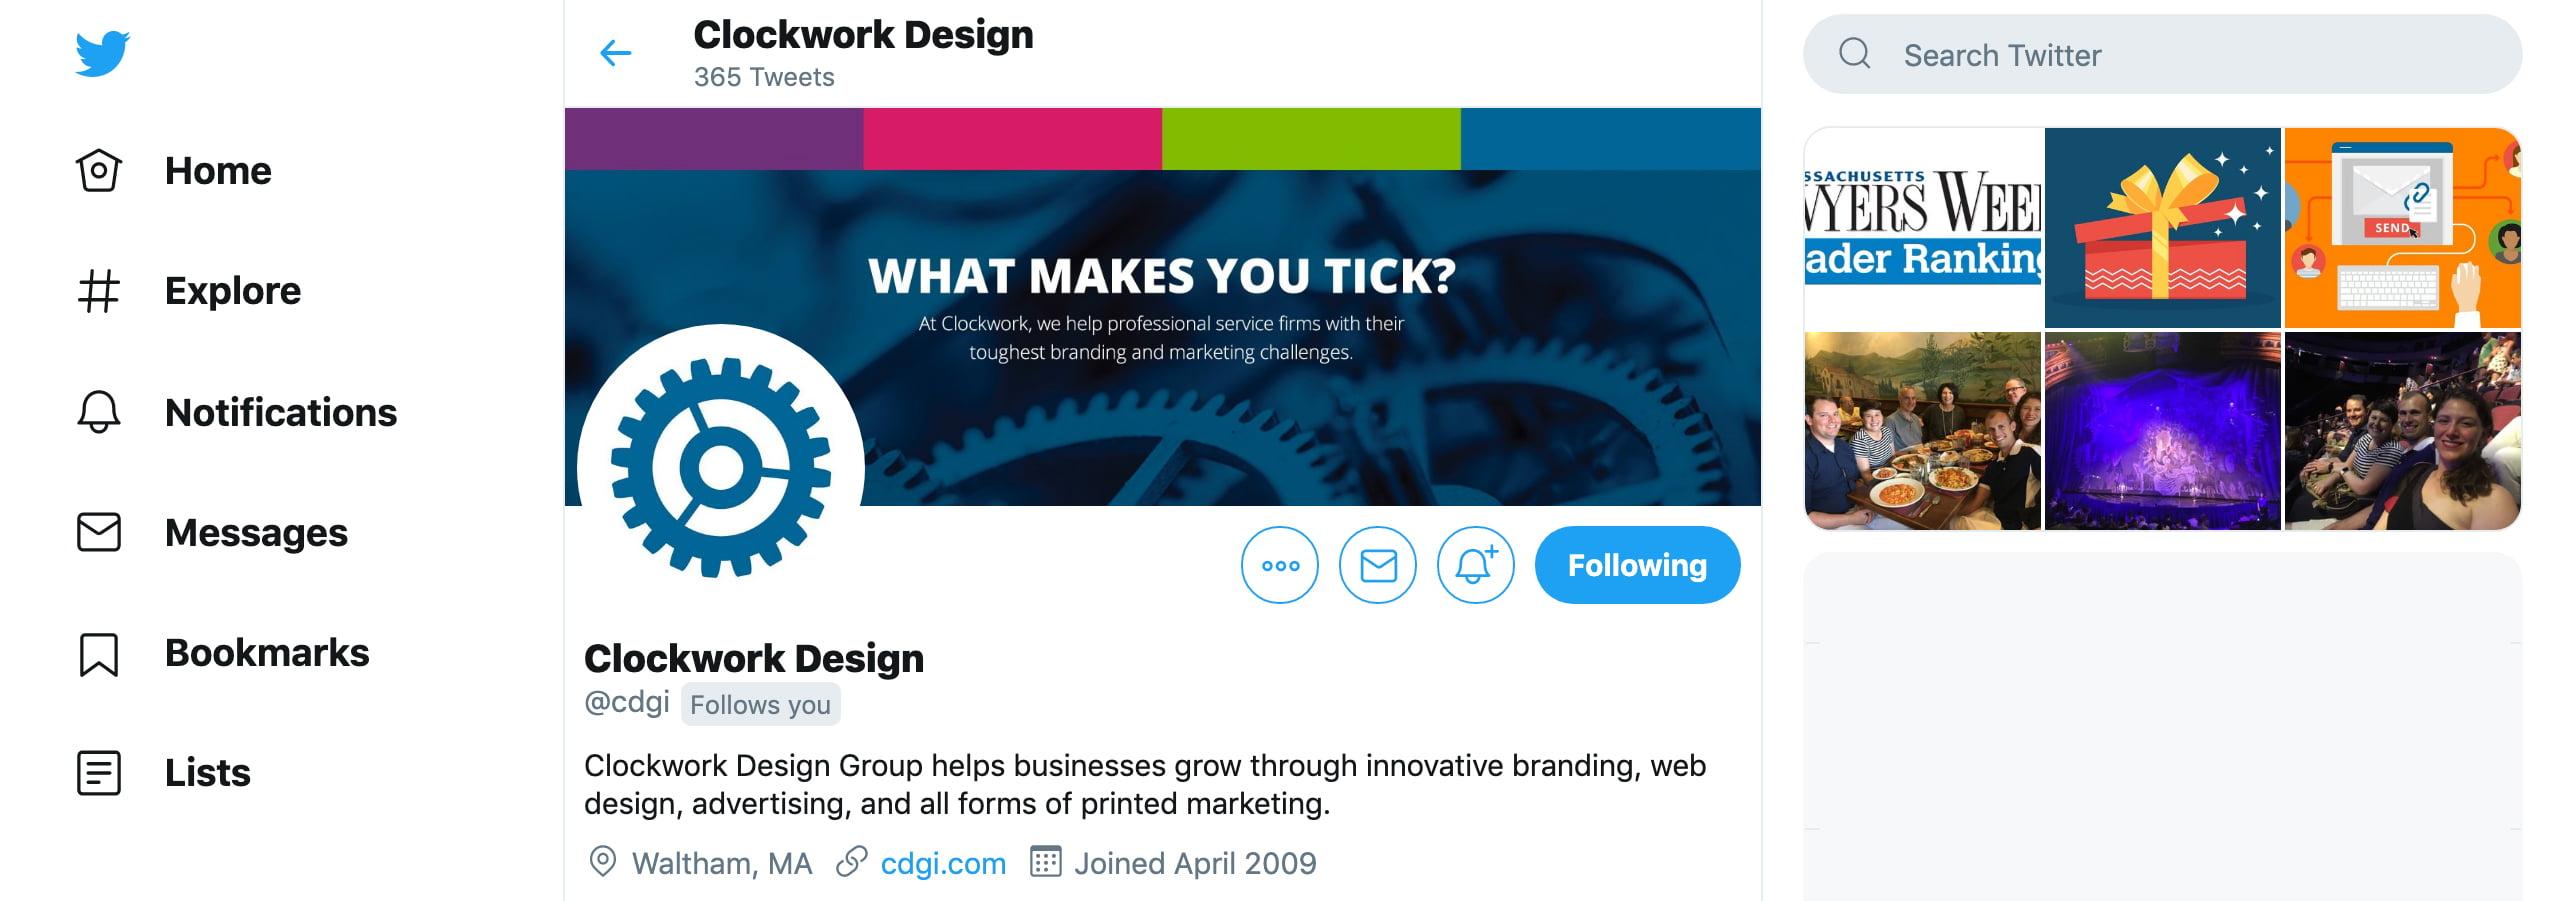 Company Cover Photos For Social Media Clockwork Design Group Inc